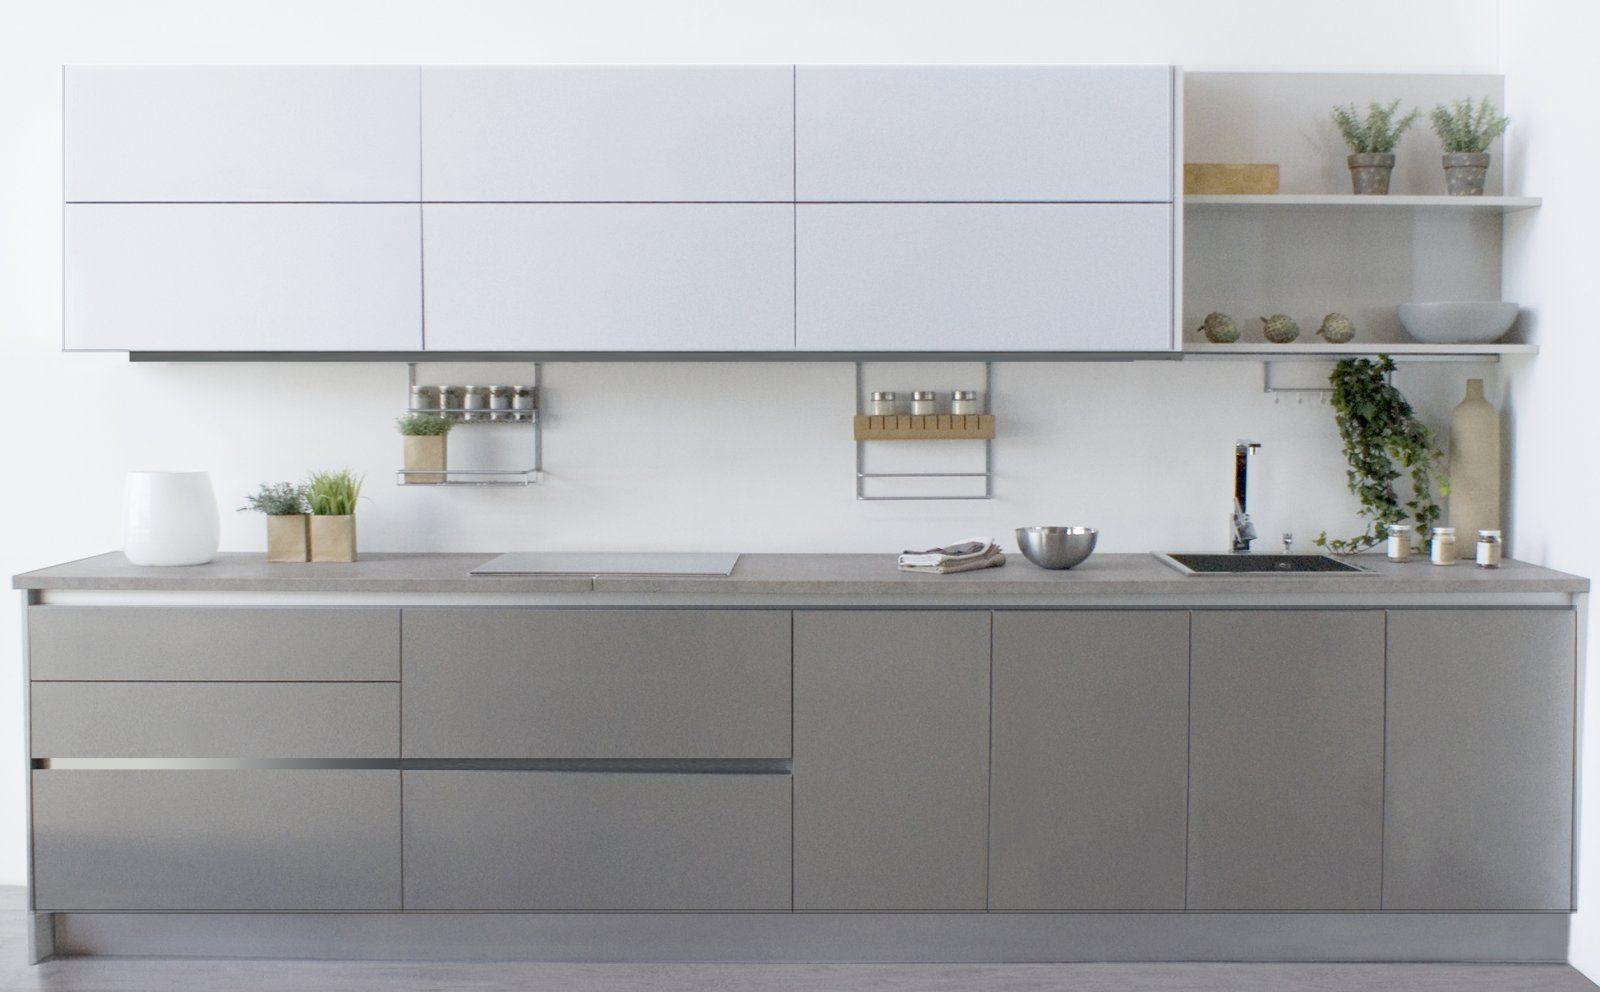 cocina distribución muebles | Interior | Pinterest | Kitchens ...